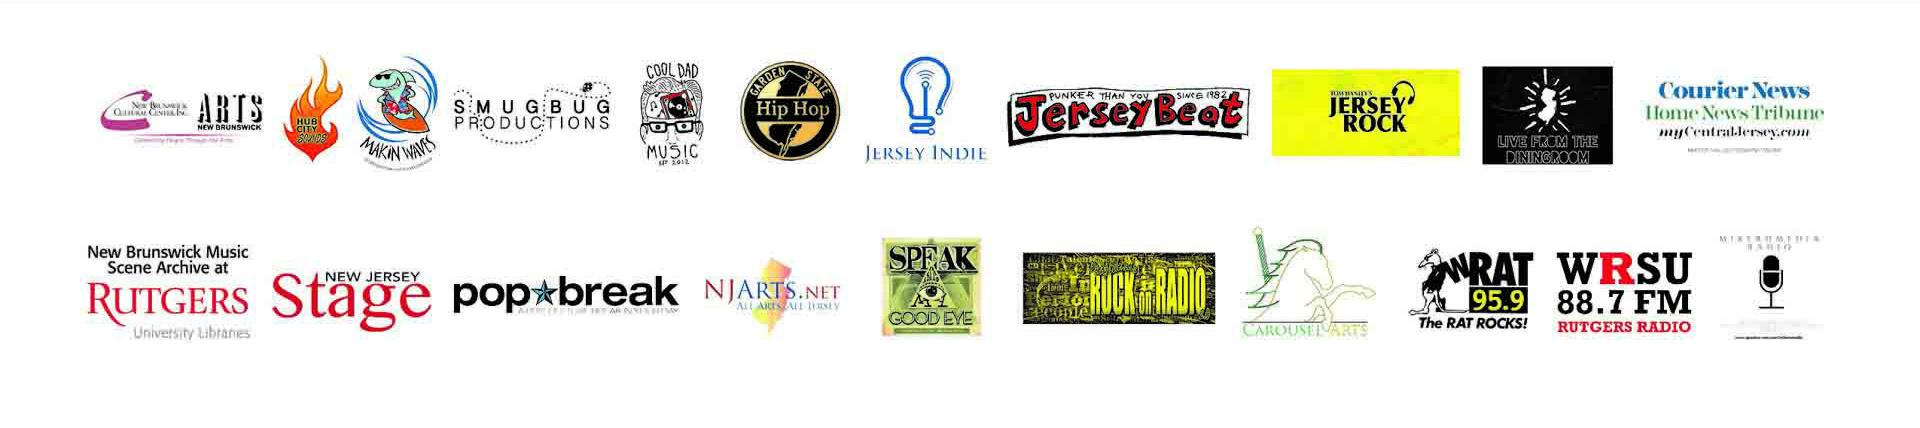 ROCK New Brunswick media partners.jpg